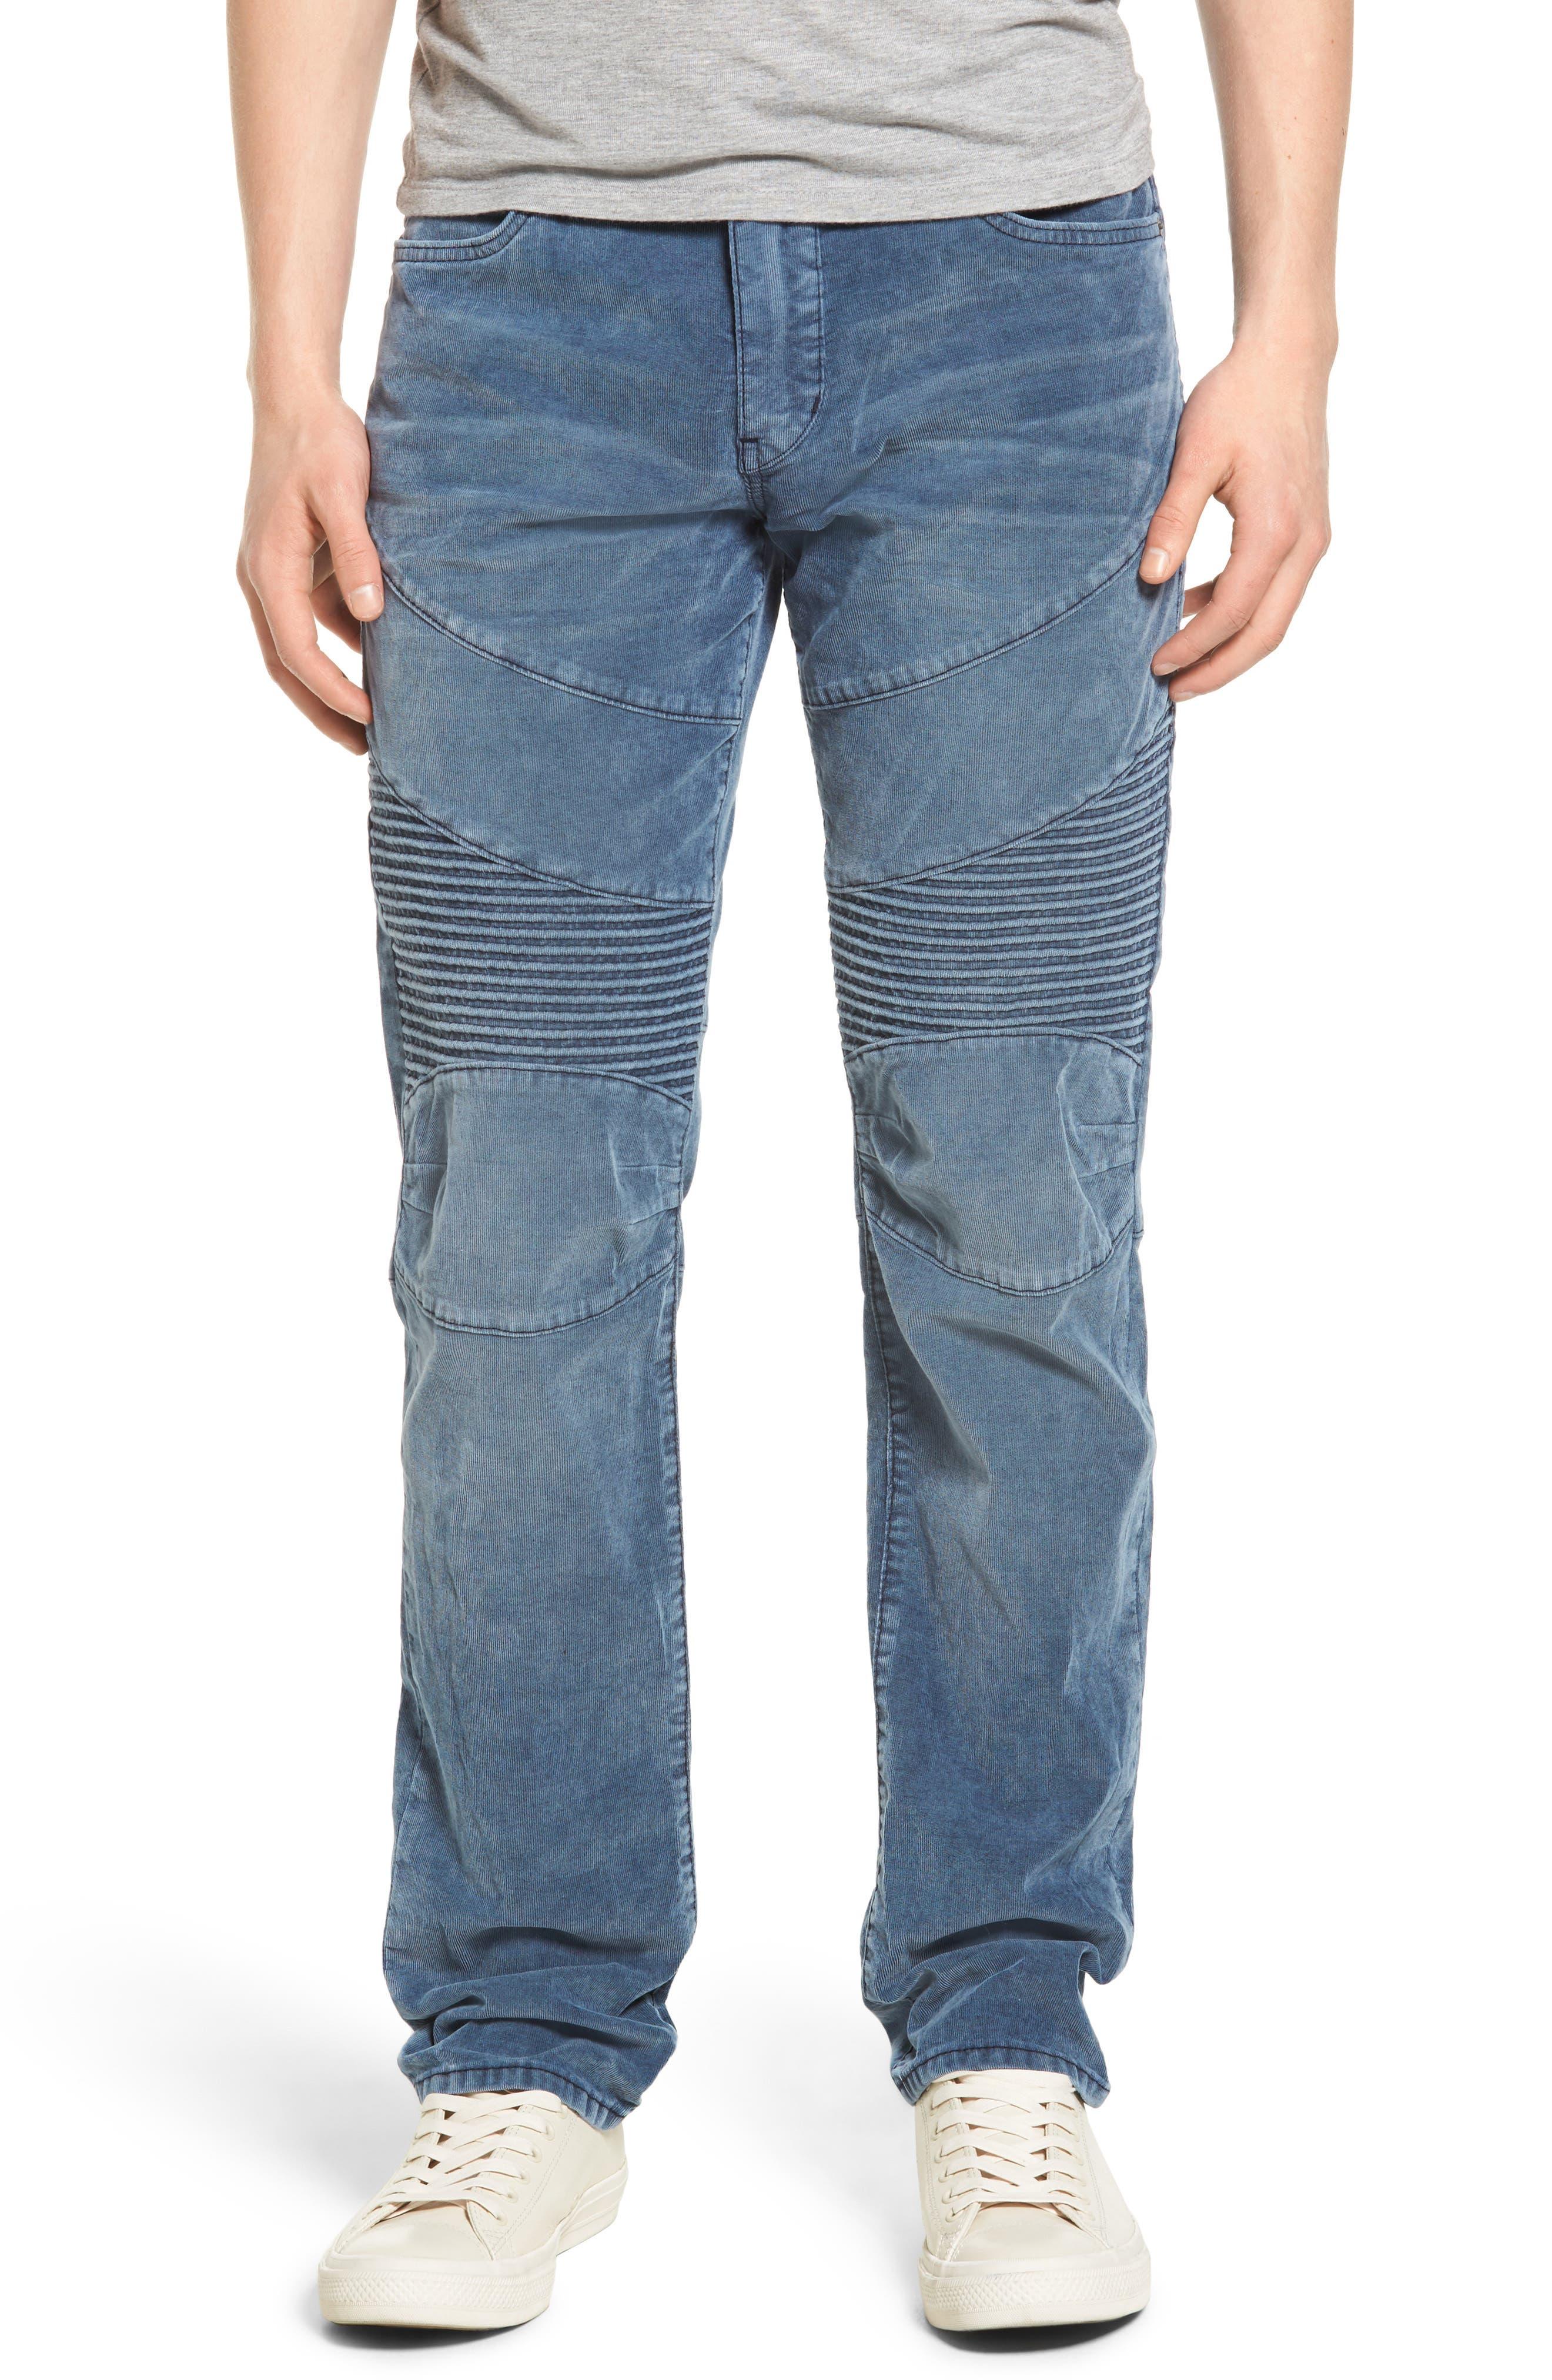 True Religion Brand Jeans Geno Straight Leg Corduroy Moto Pants